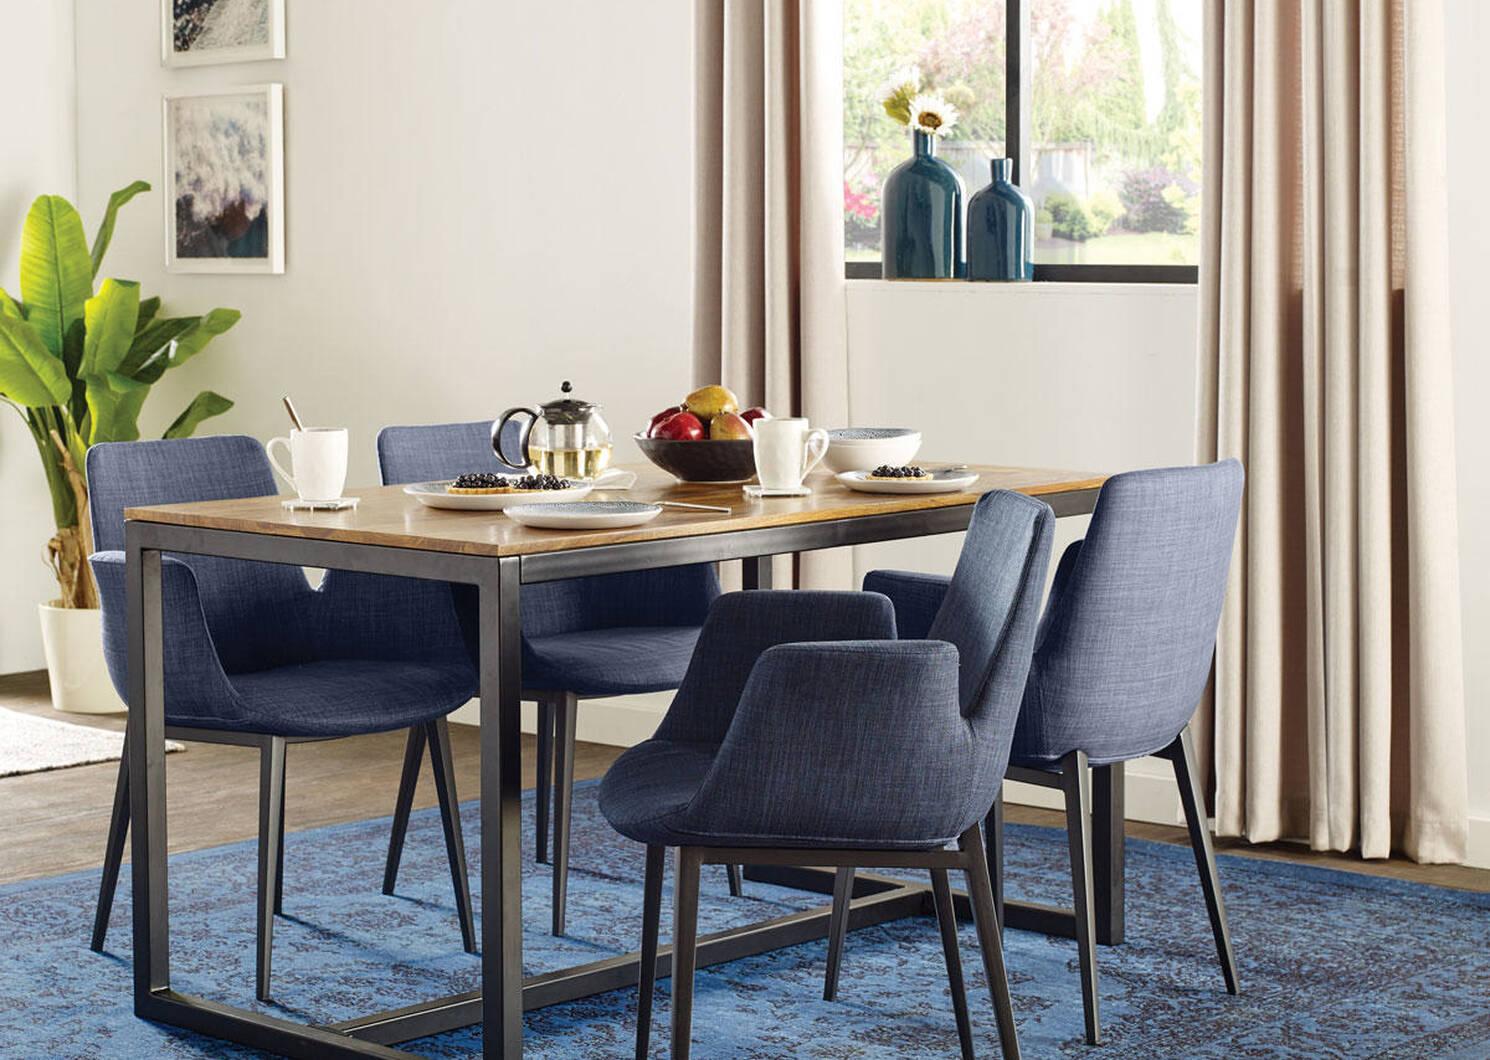 Crosby Dining Table 55-Sheesham